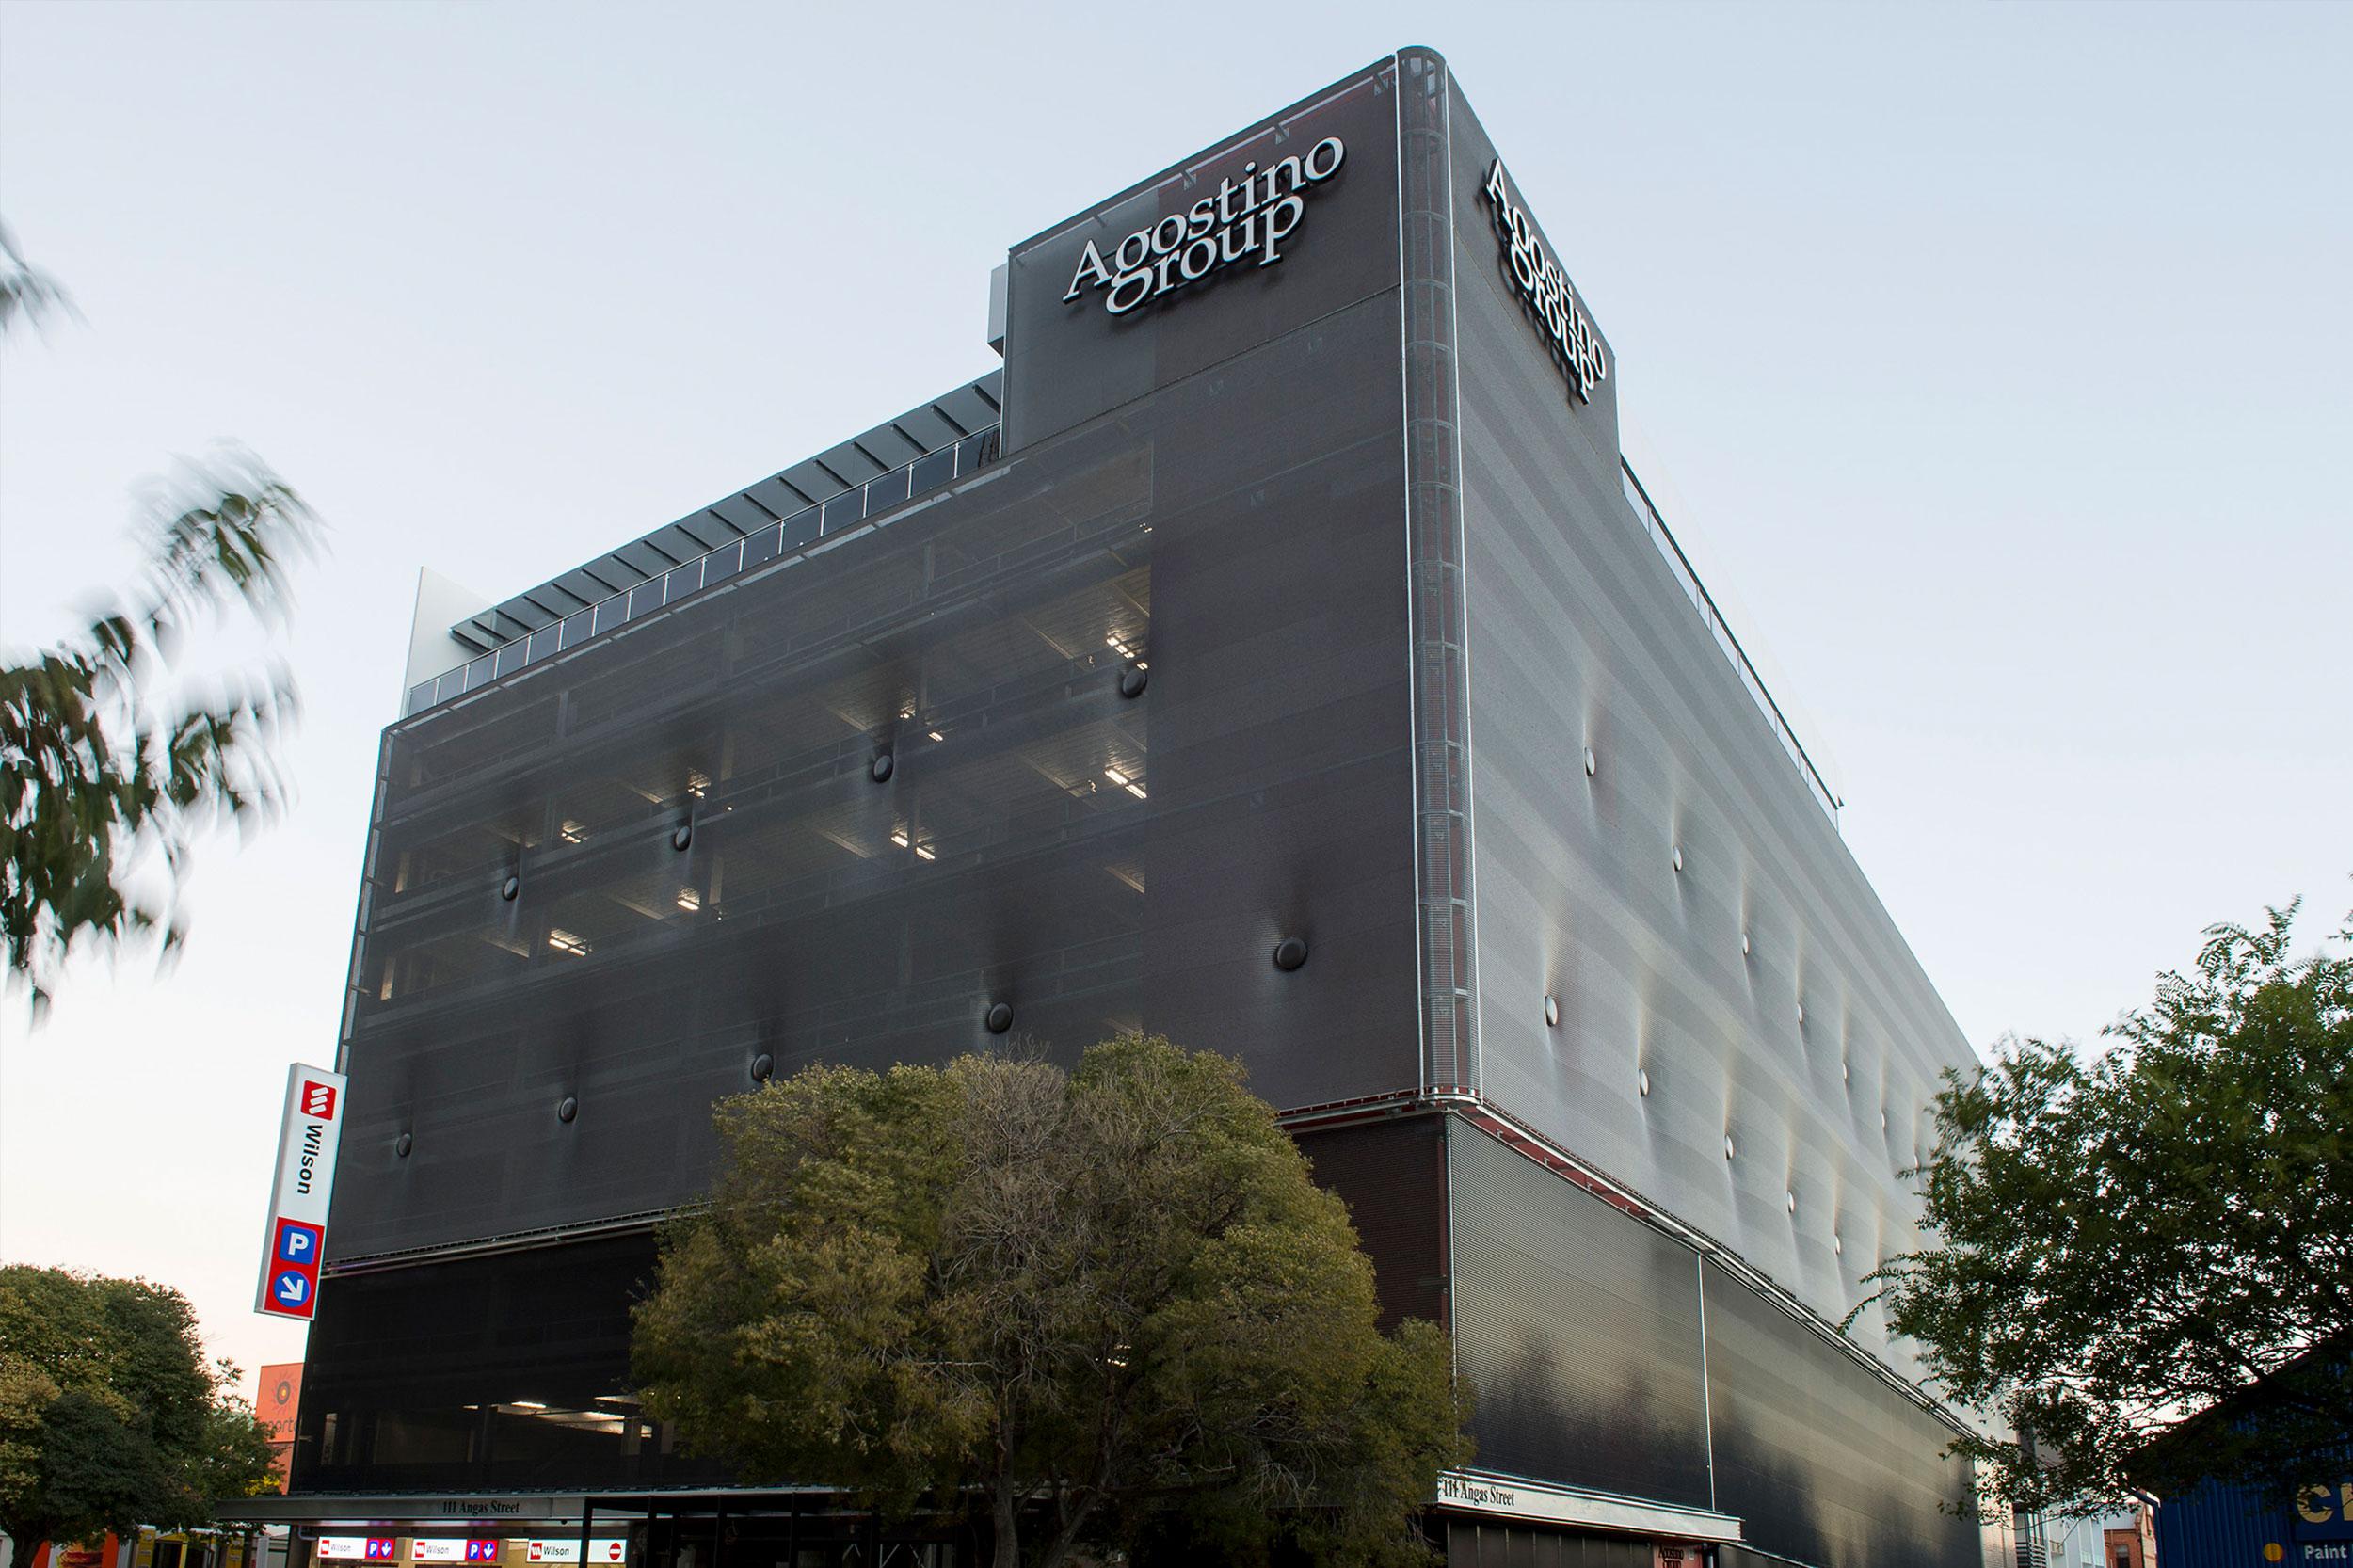 Agostino Group Parking Garage, Australia